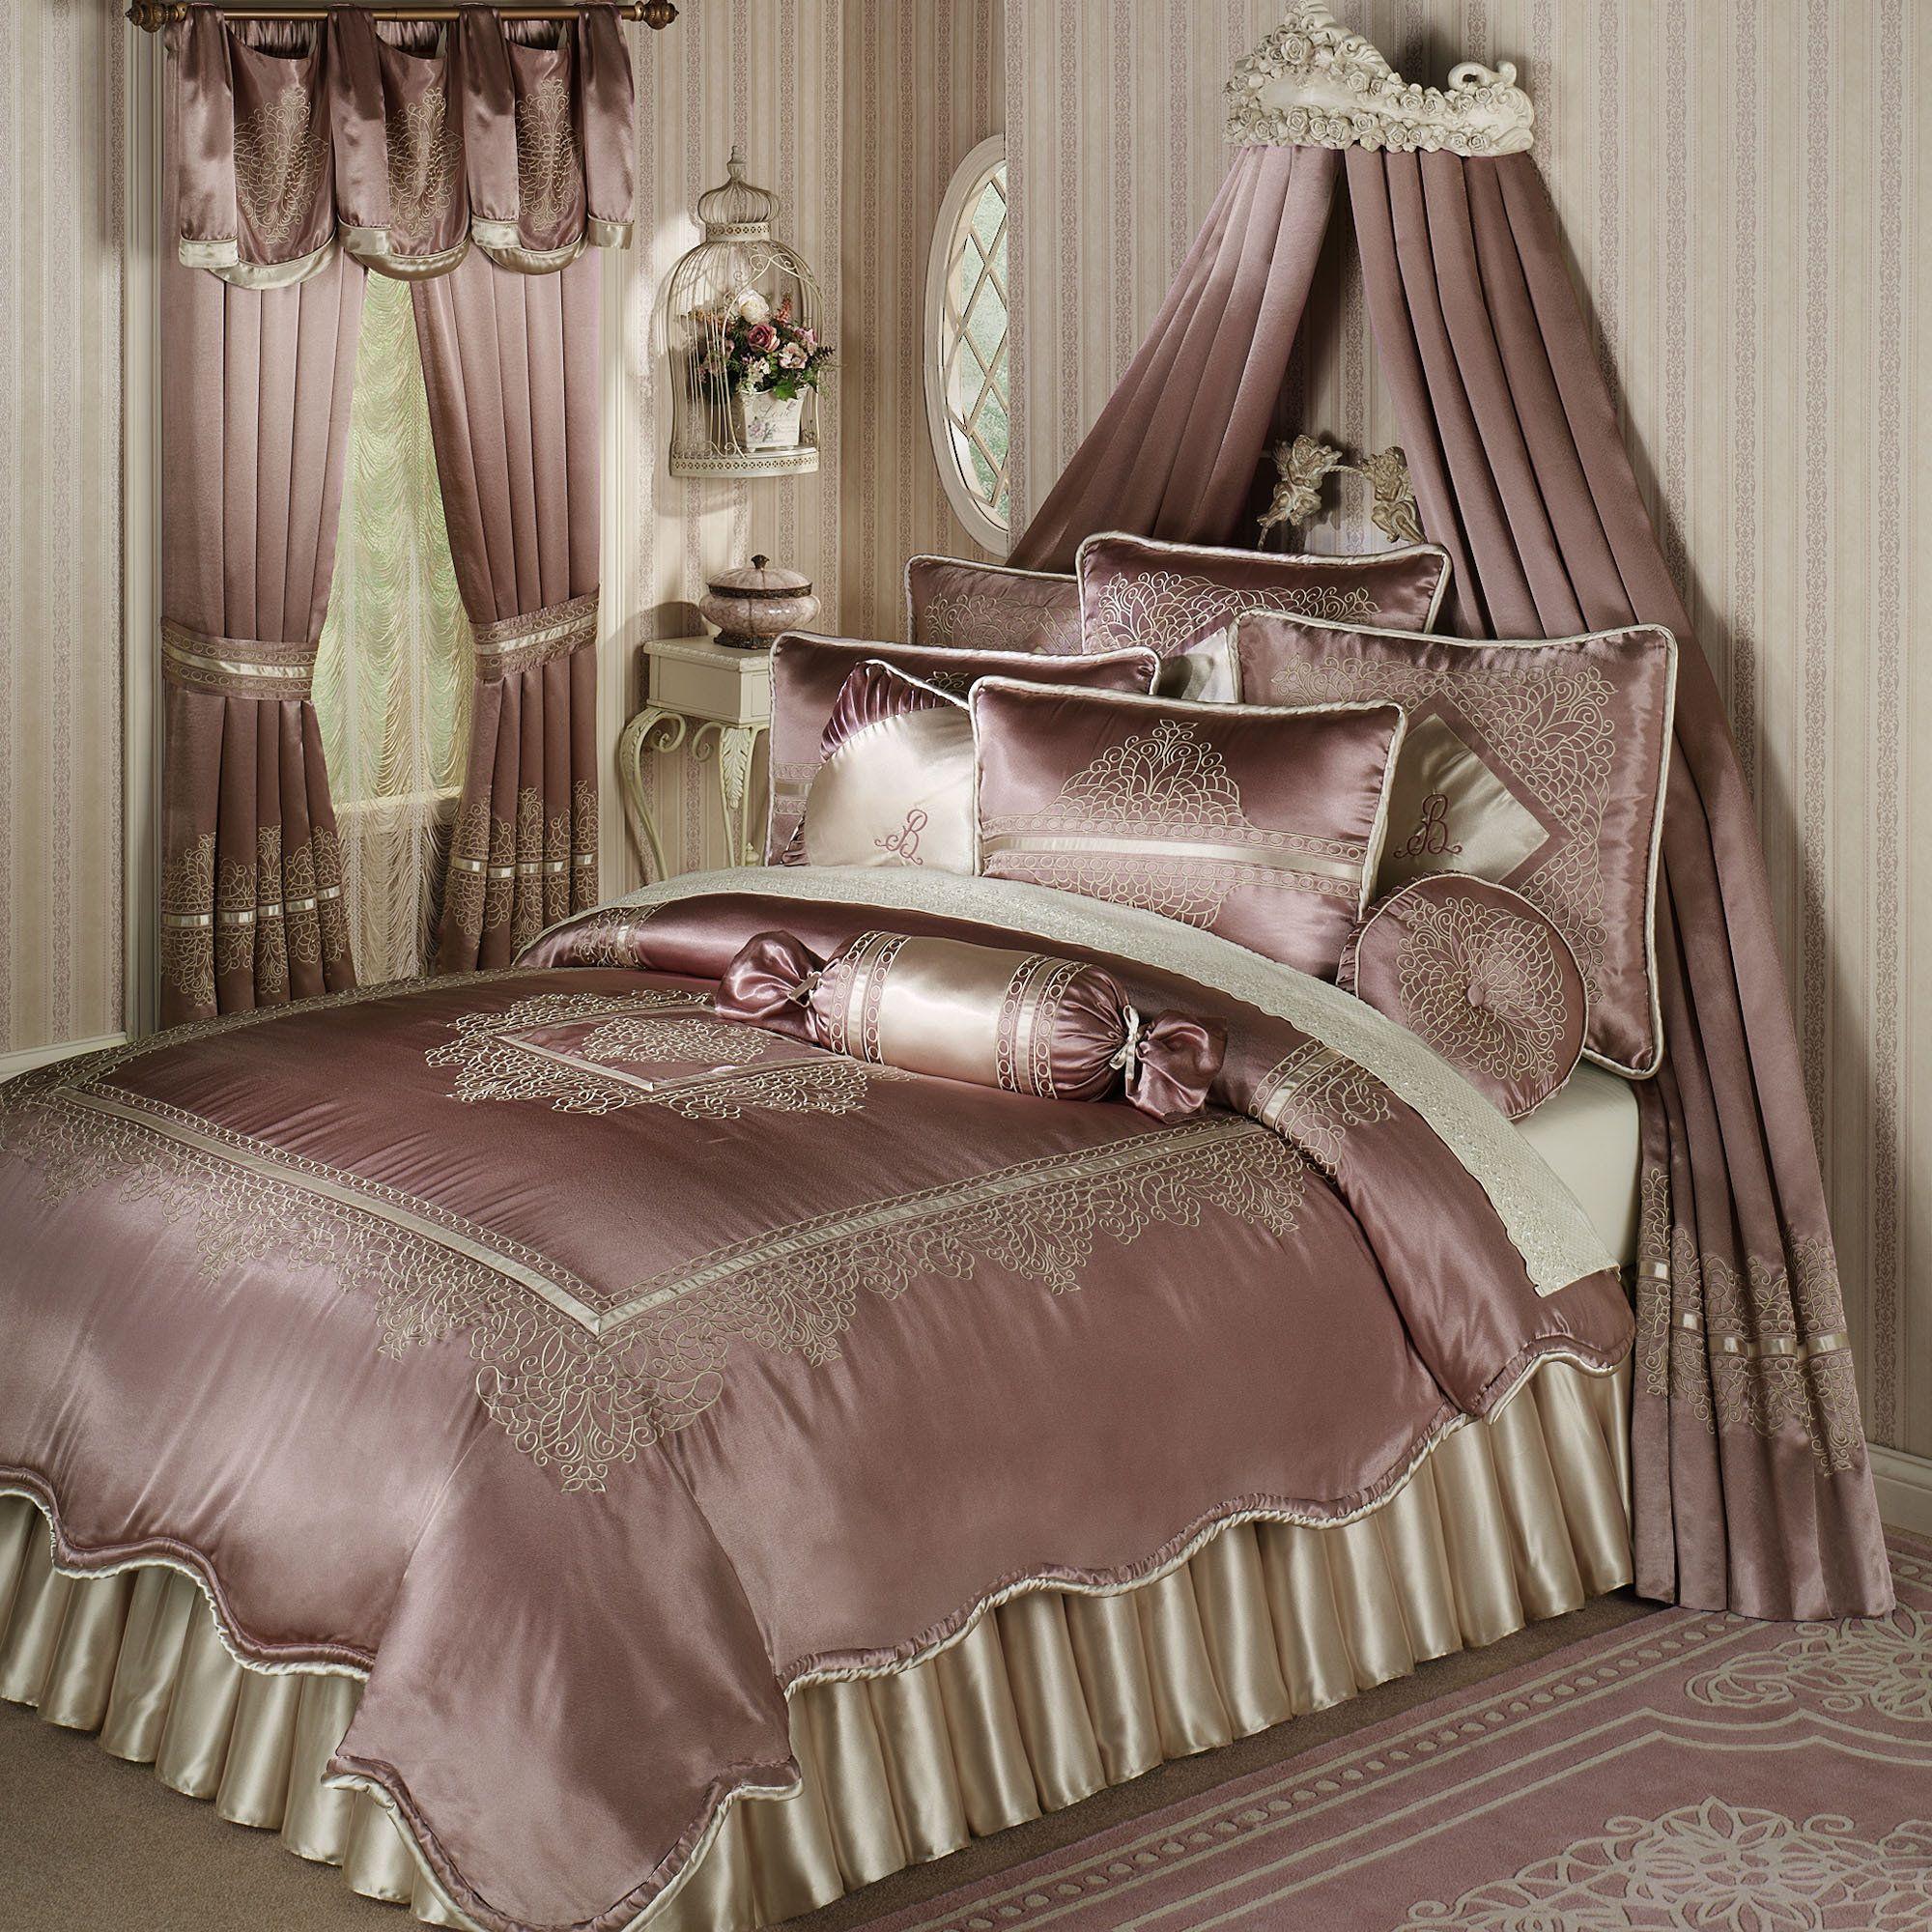 blue comforter aetherair park asli complete and whitman sheet set cotton madison satin co